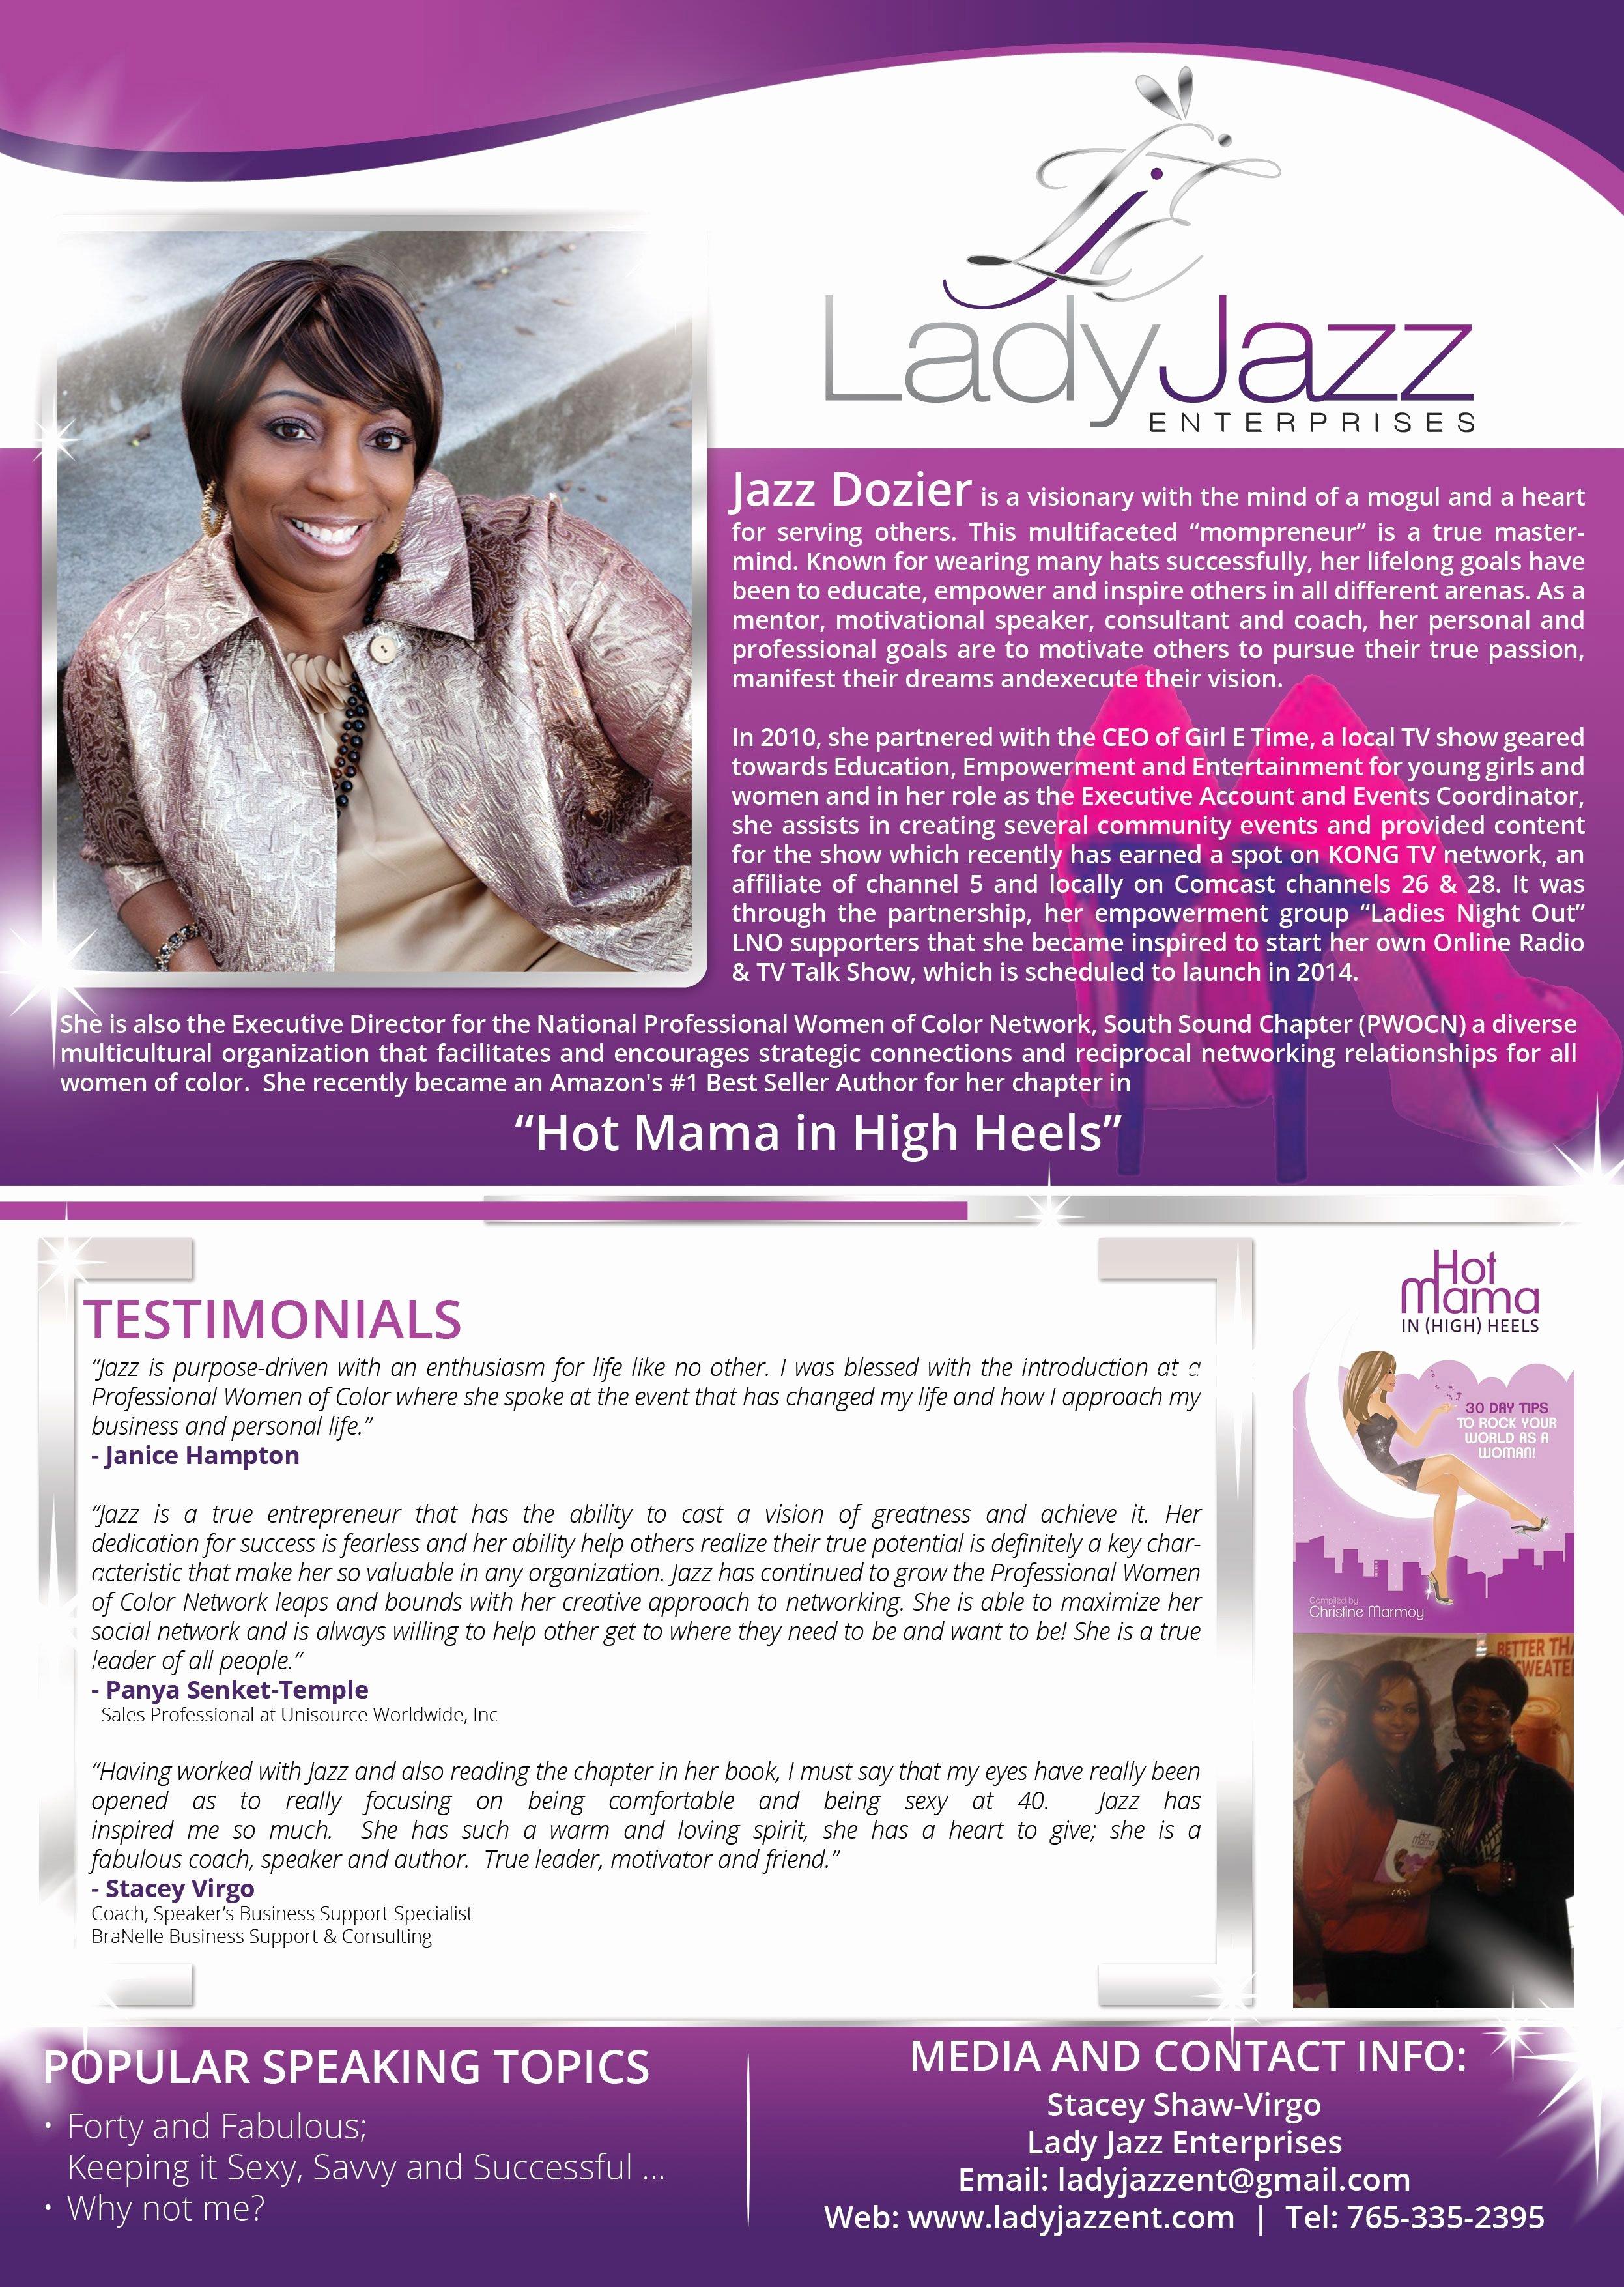 Jazz Dozier Also Known as Lady Jazz Speaker One Sheet